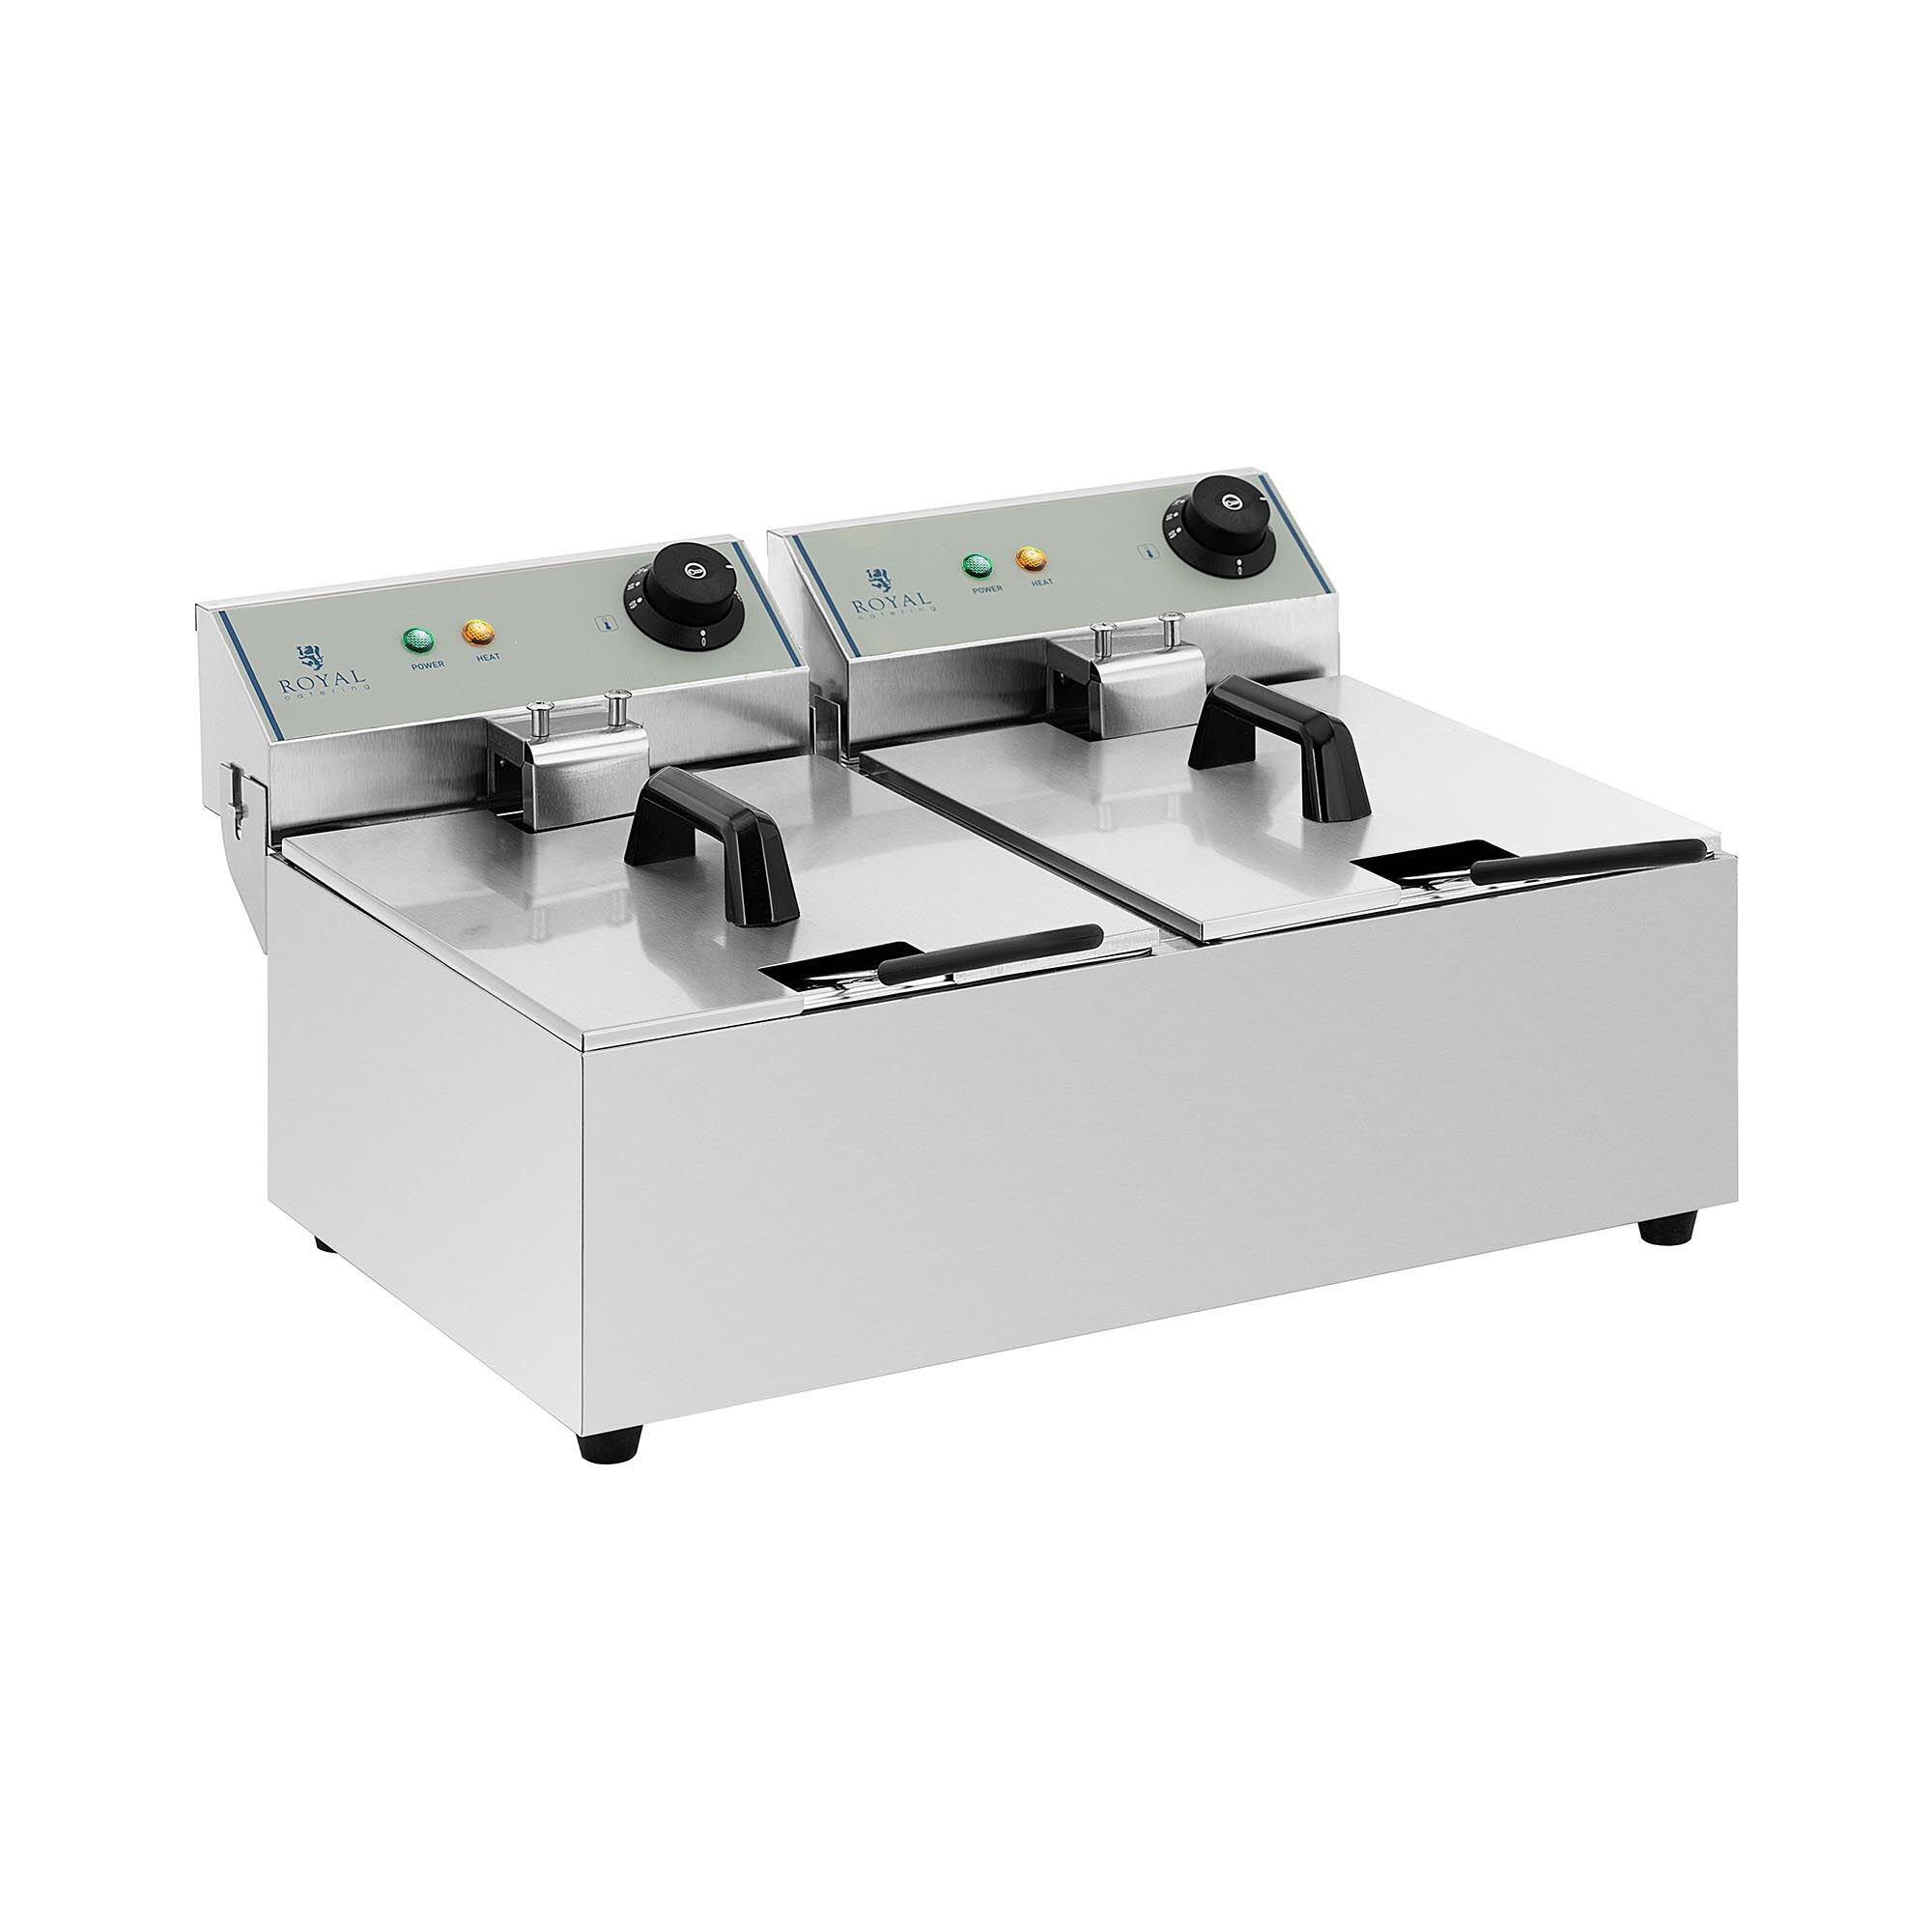 Royal Catering Friteuse électrique - 2 x 10 litres - ECO RCEF-10DY-ECO